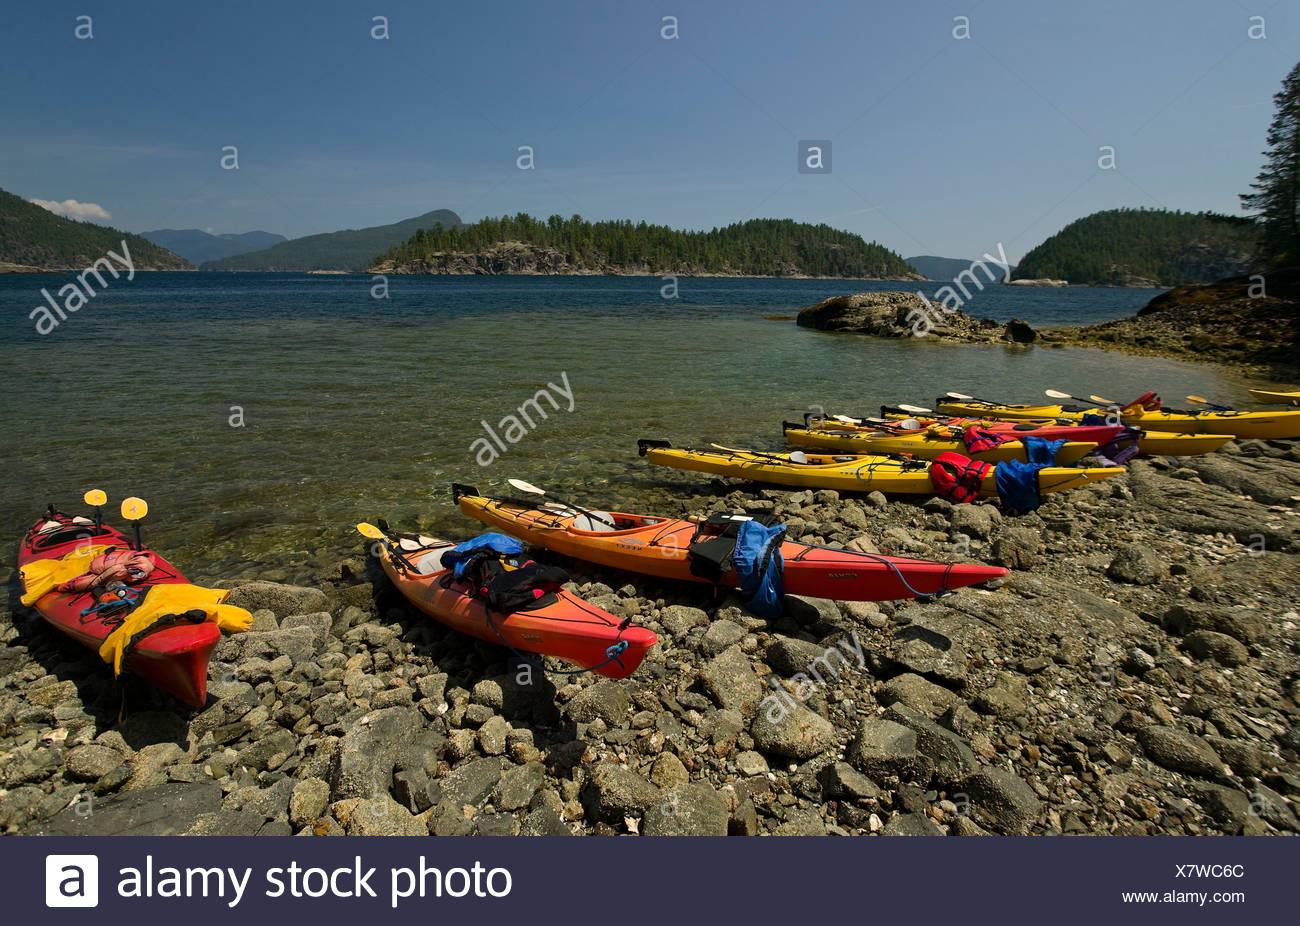 Empty kayaks lie pulled up along the shoreline of Desolation Sound. Desolation Sound, British Columbia, Canada. - Stock Image